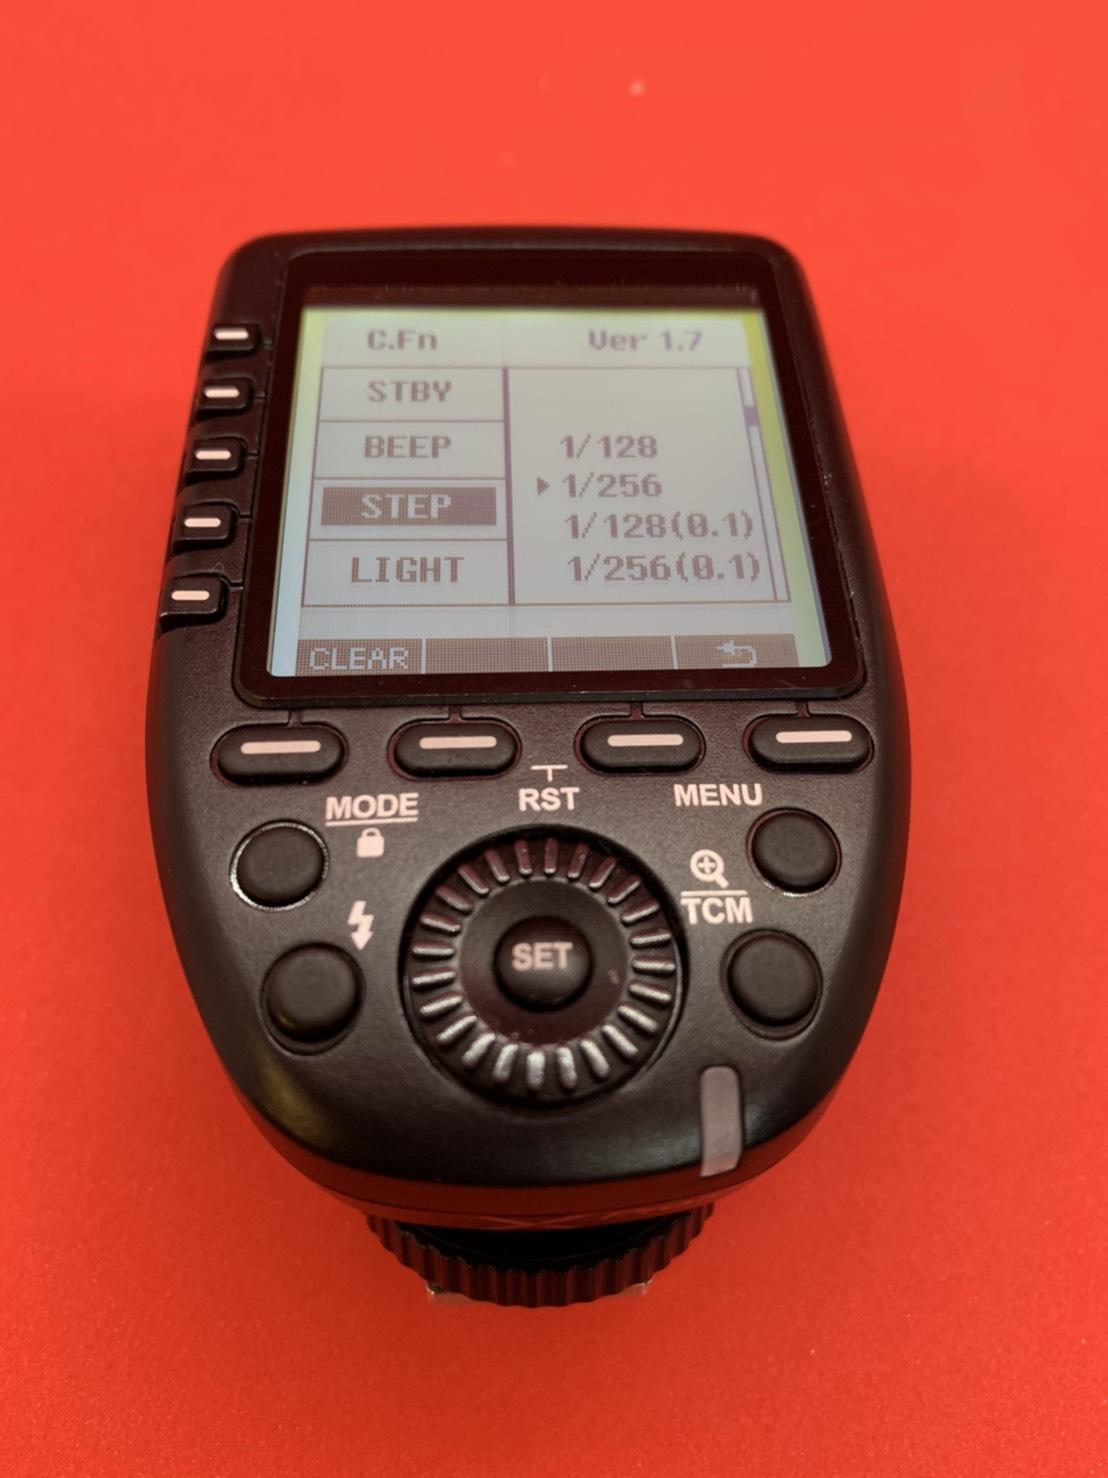 Godox AD200proで1/256発光を使う方法!